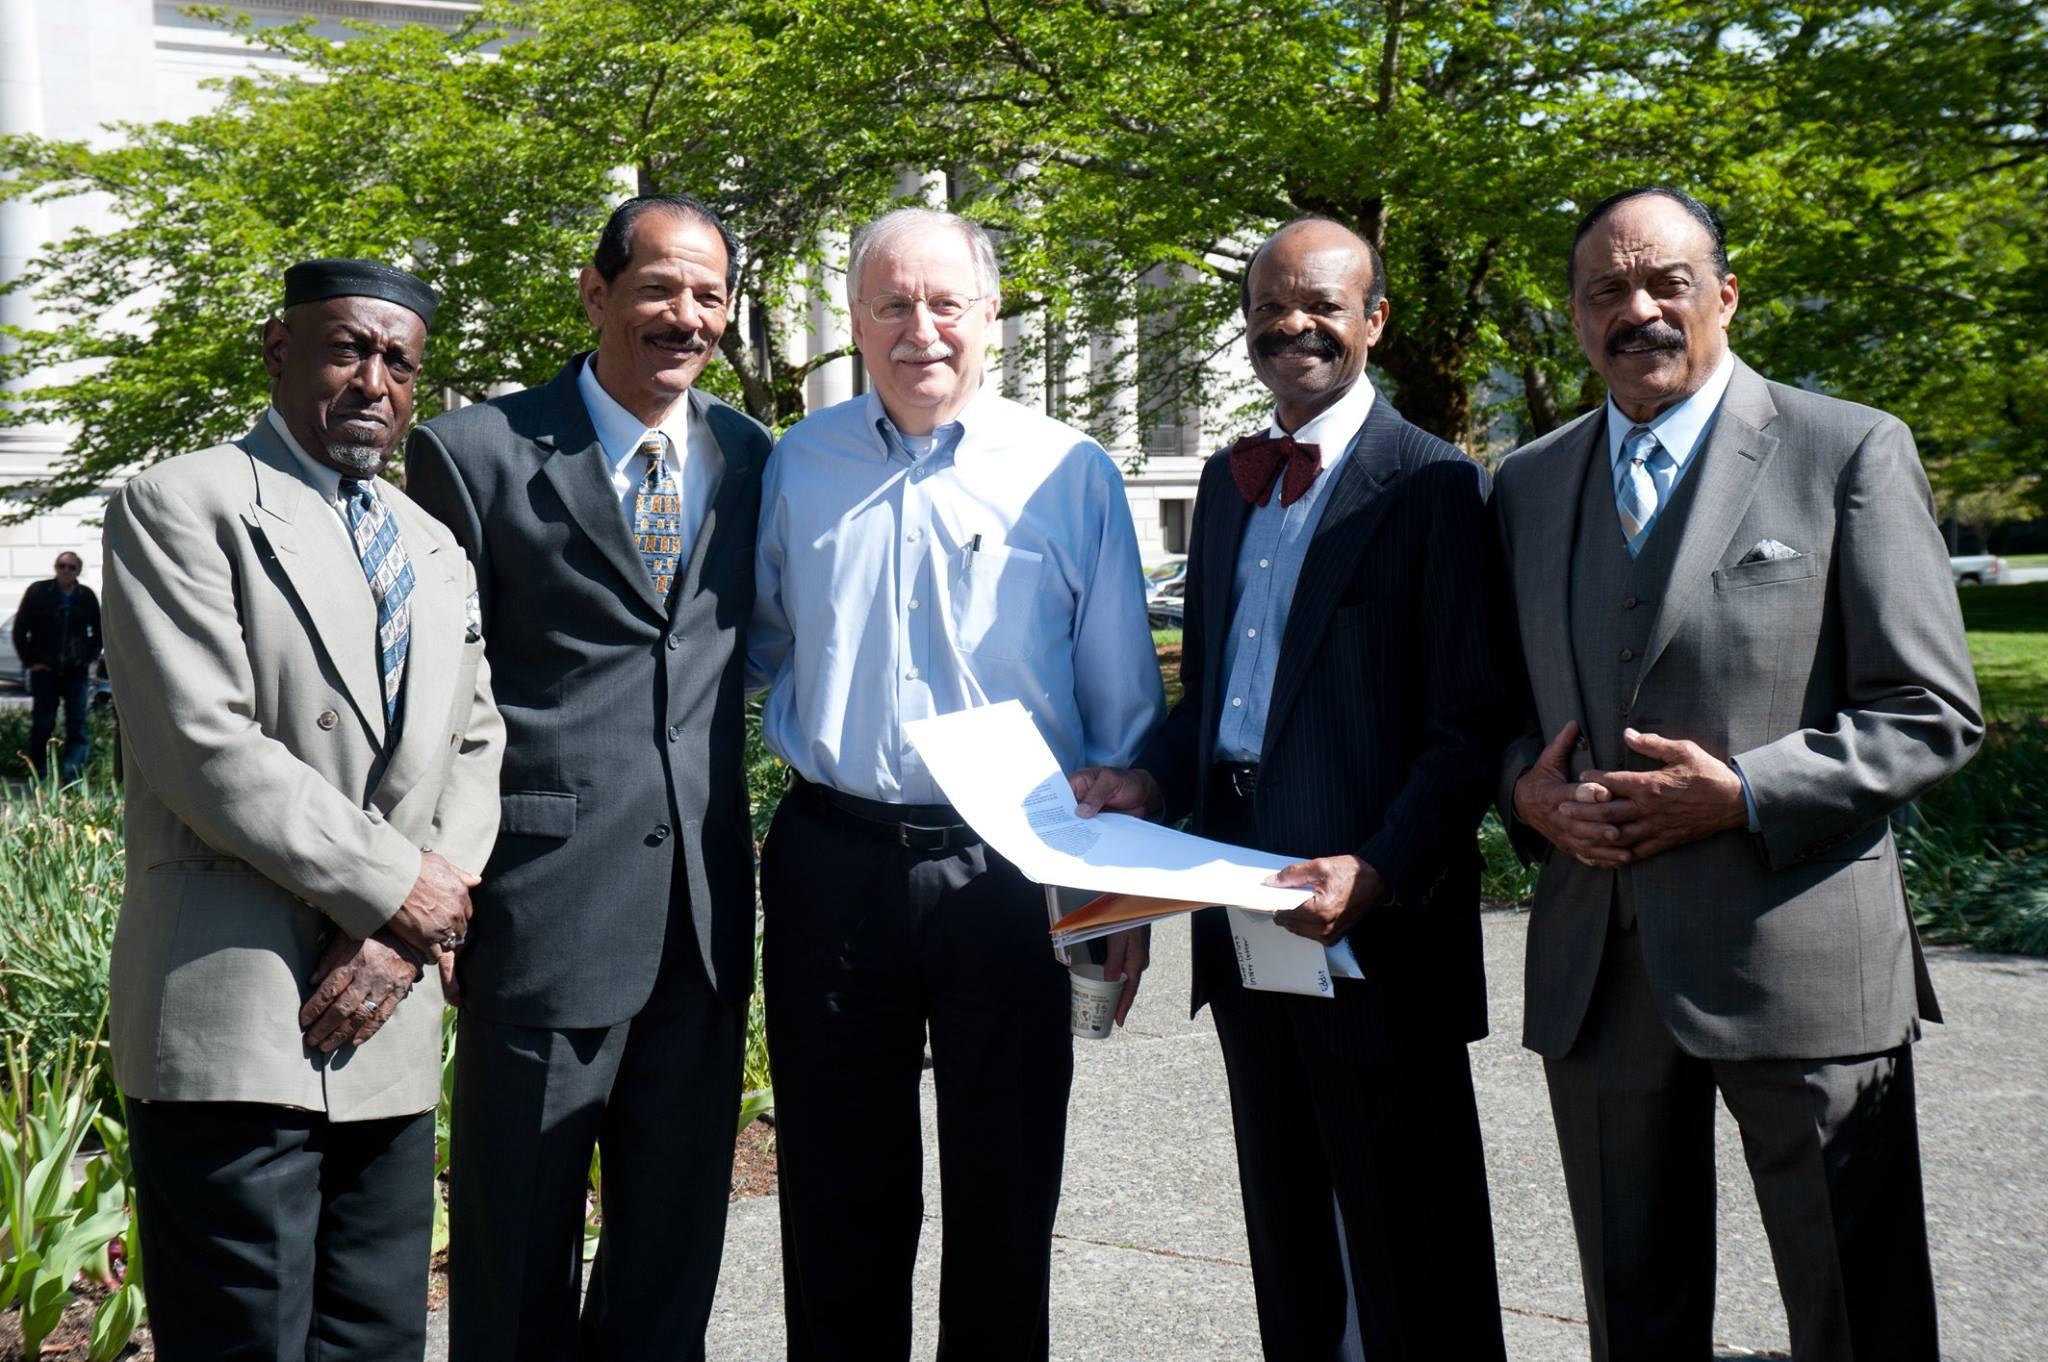 Civil Rights Coalition and Frank Chopp